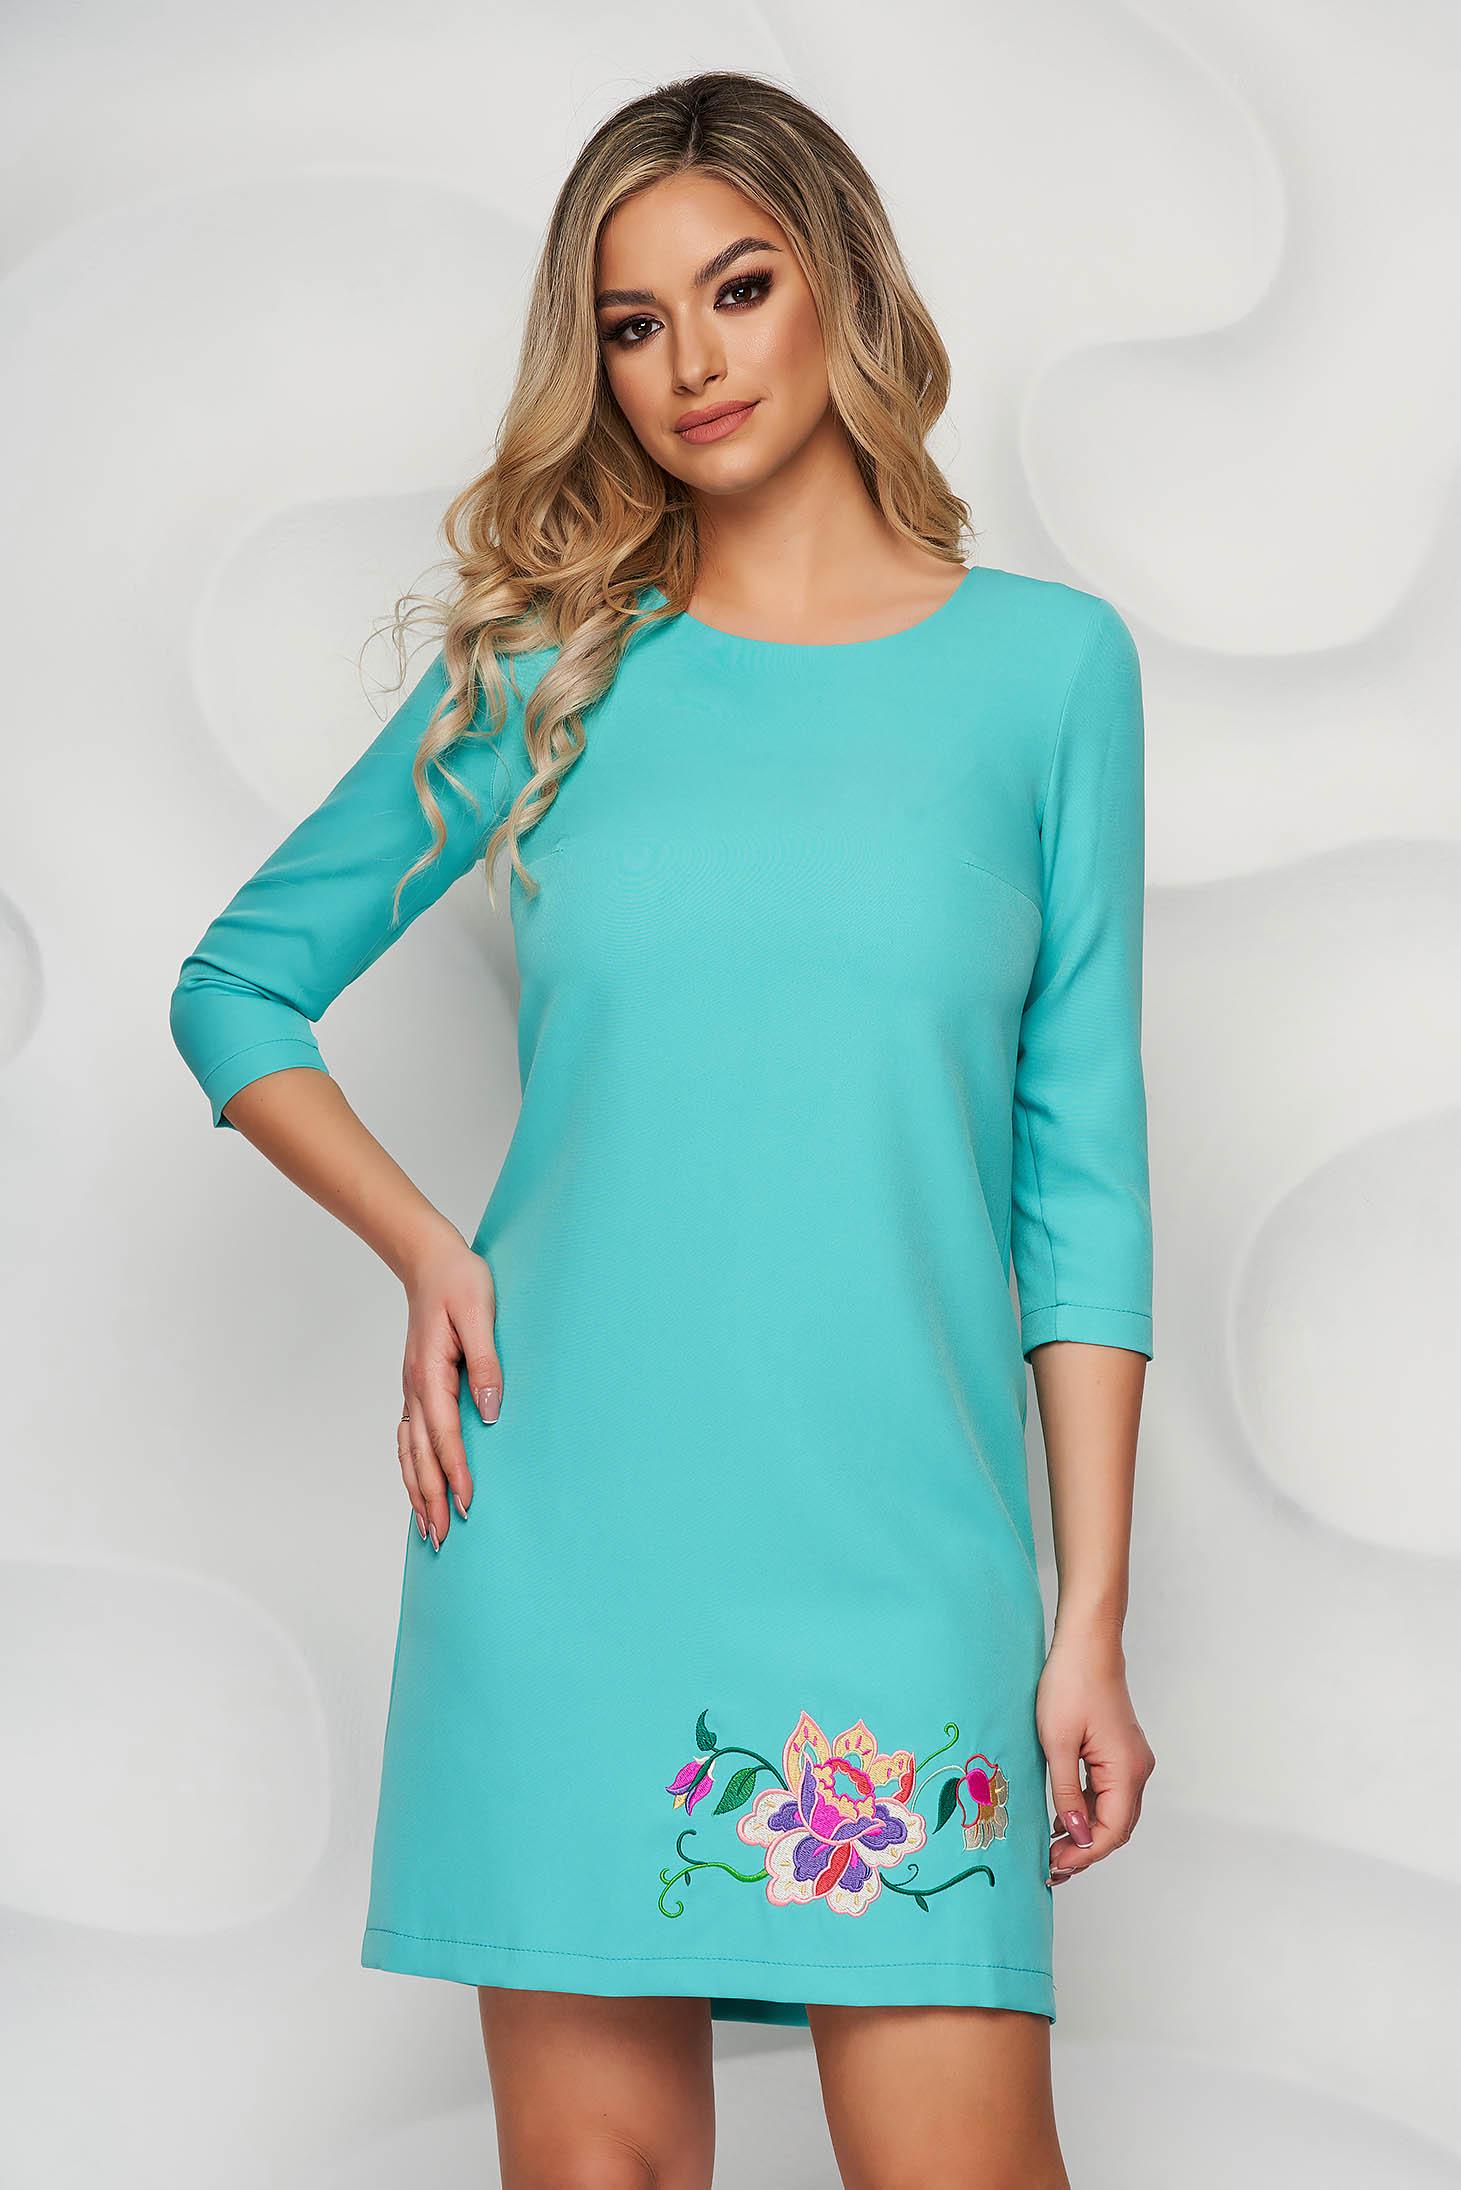 Turquoise StarShinerS dress